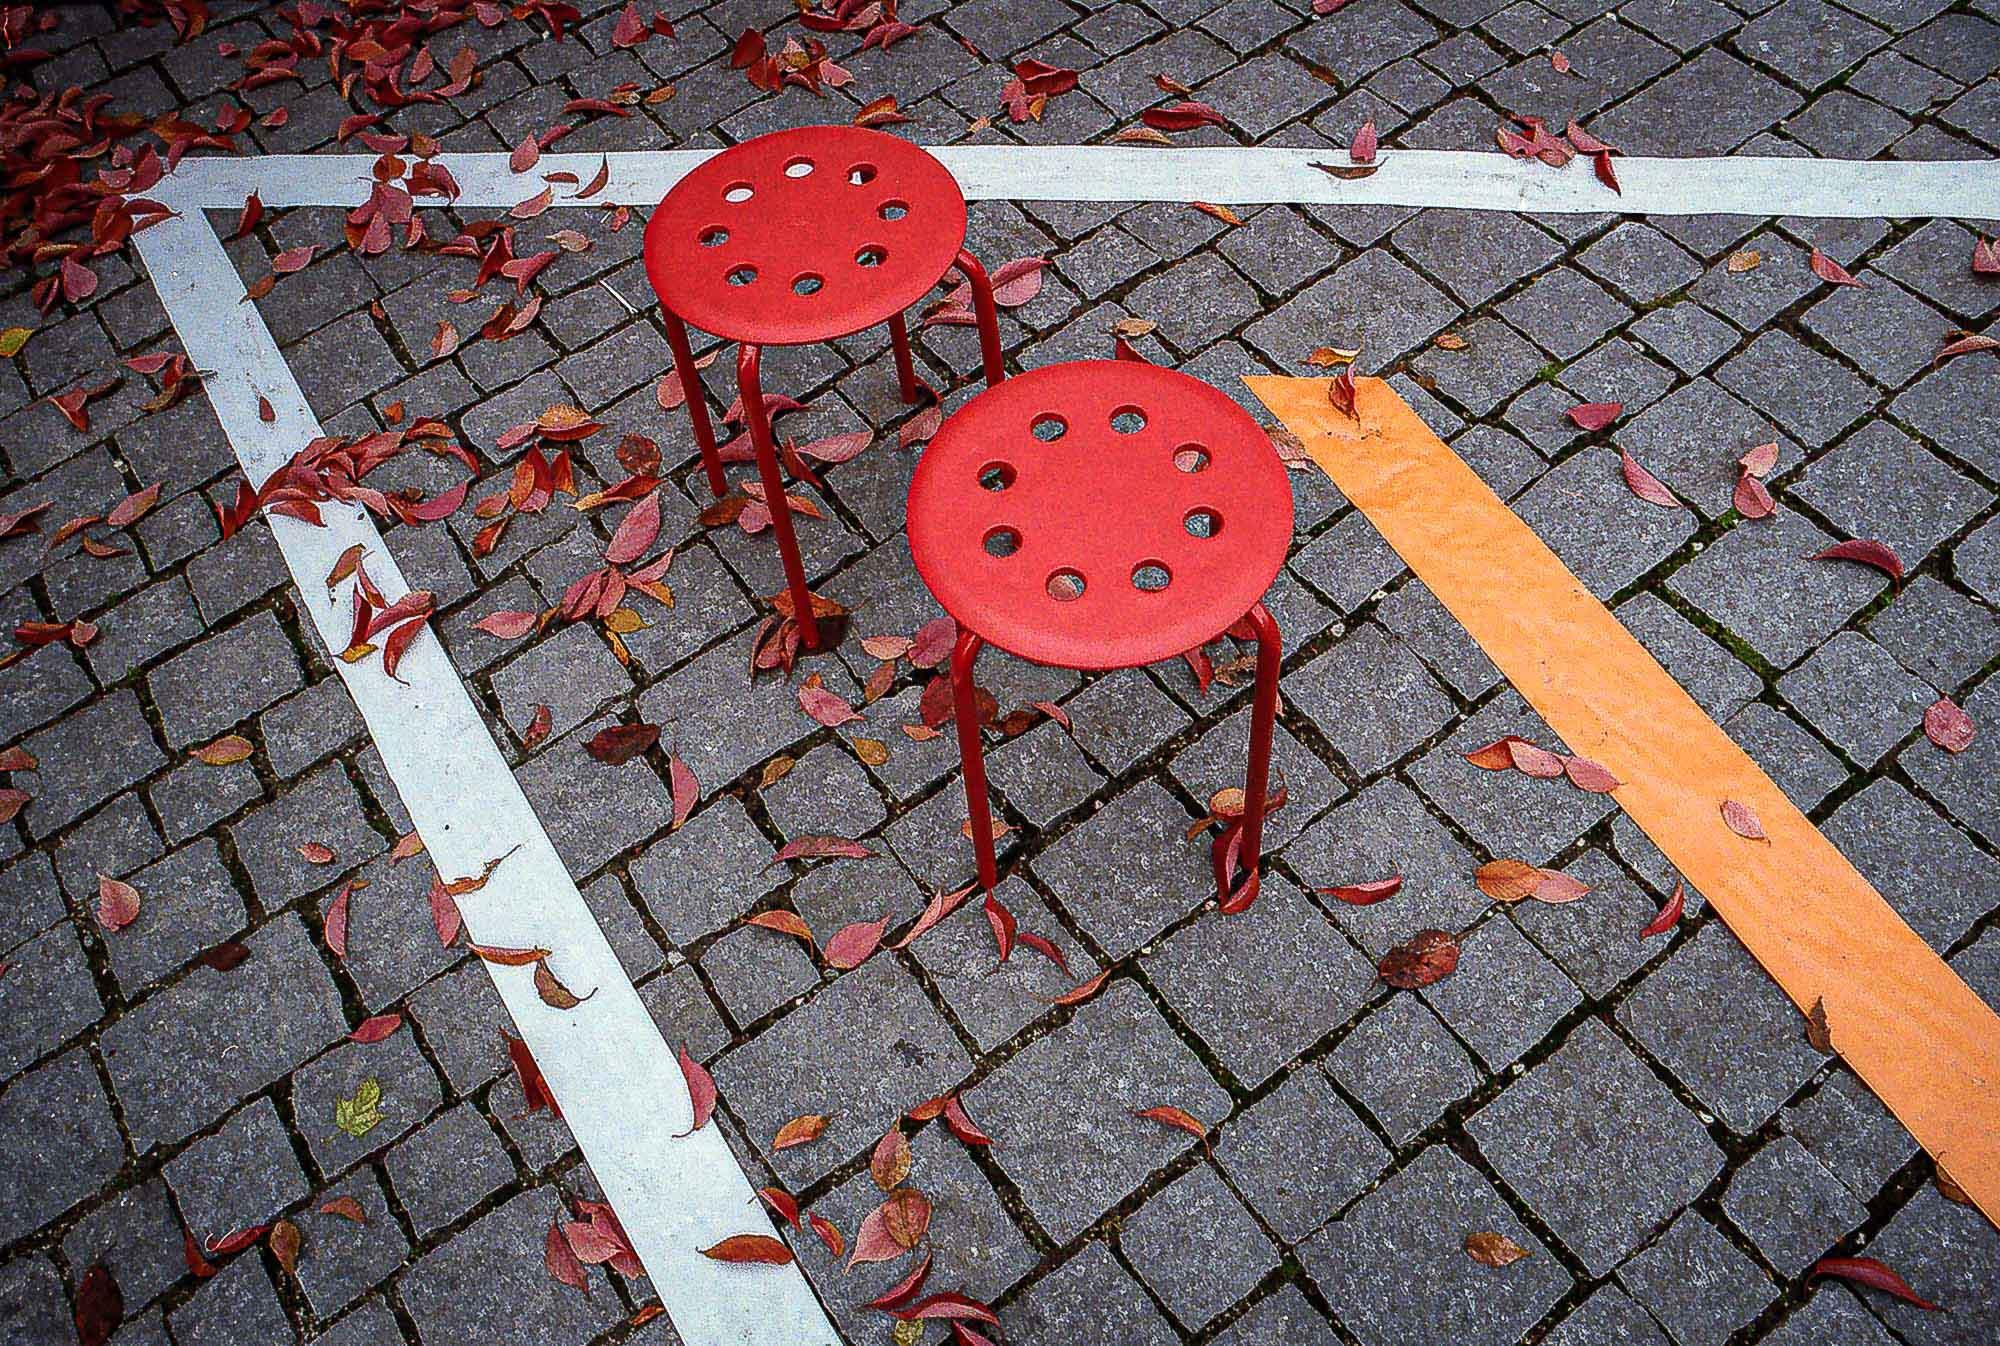 UnclePete / Etwas Geometrie im Herbst